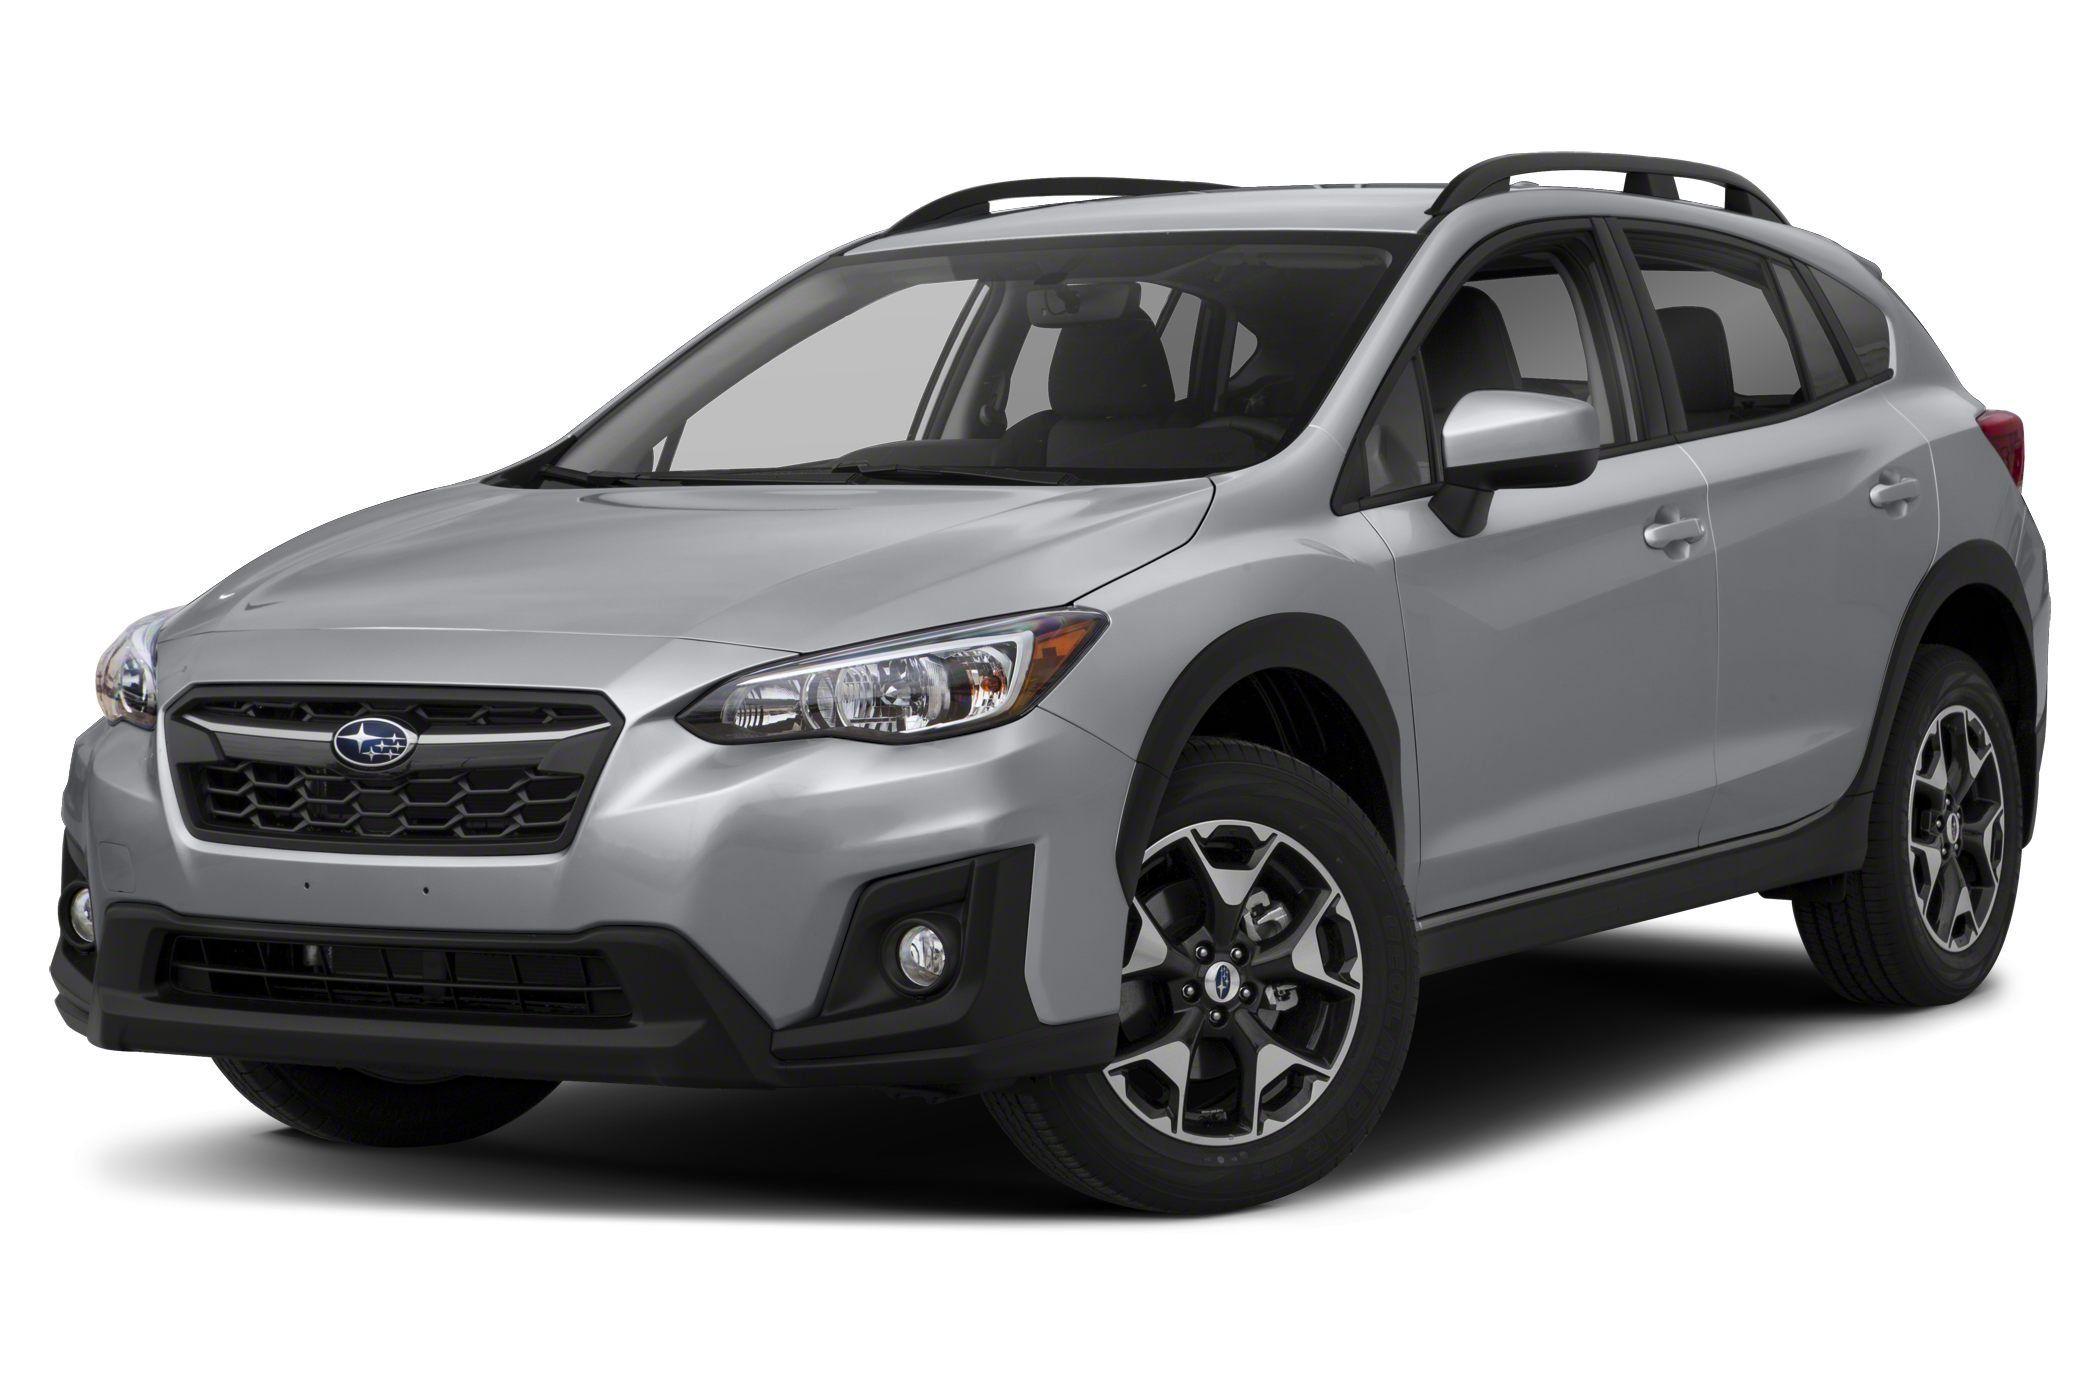 2020 Subaru Impreza Price And Release Date Subaru Crosstrek Subaru Models Subaru